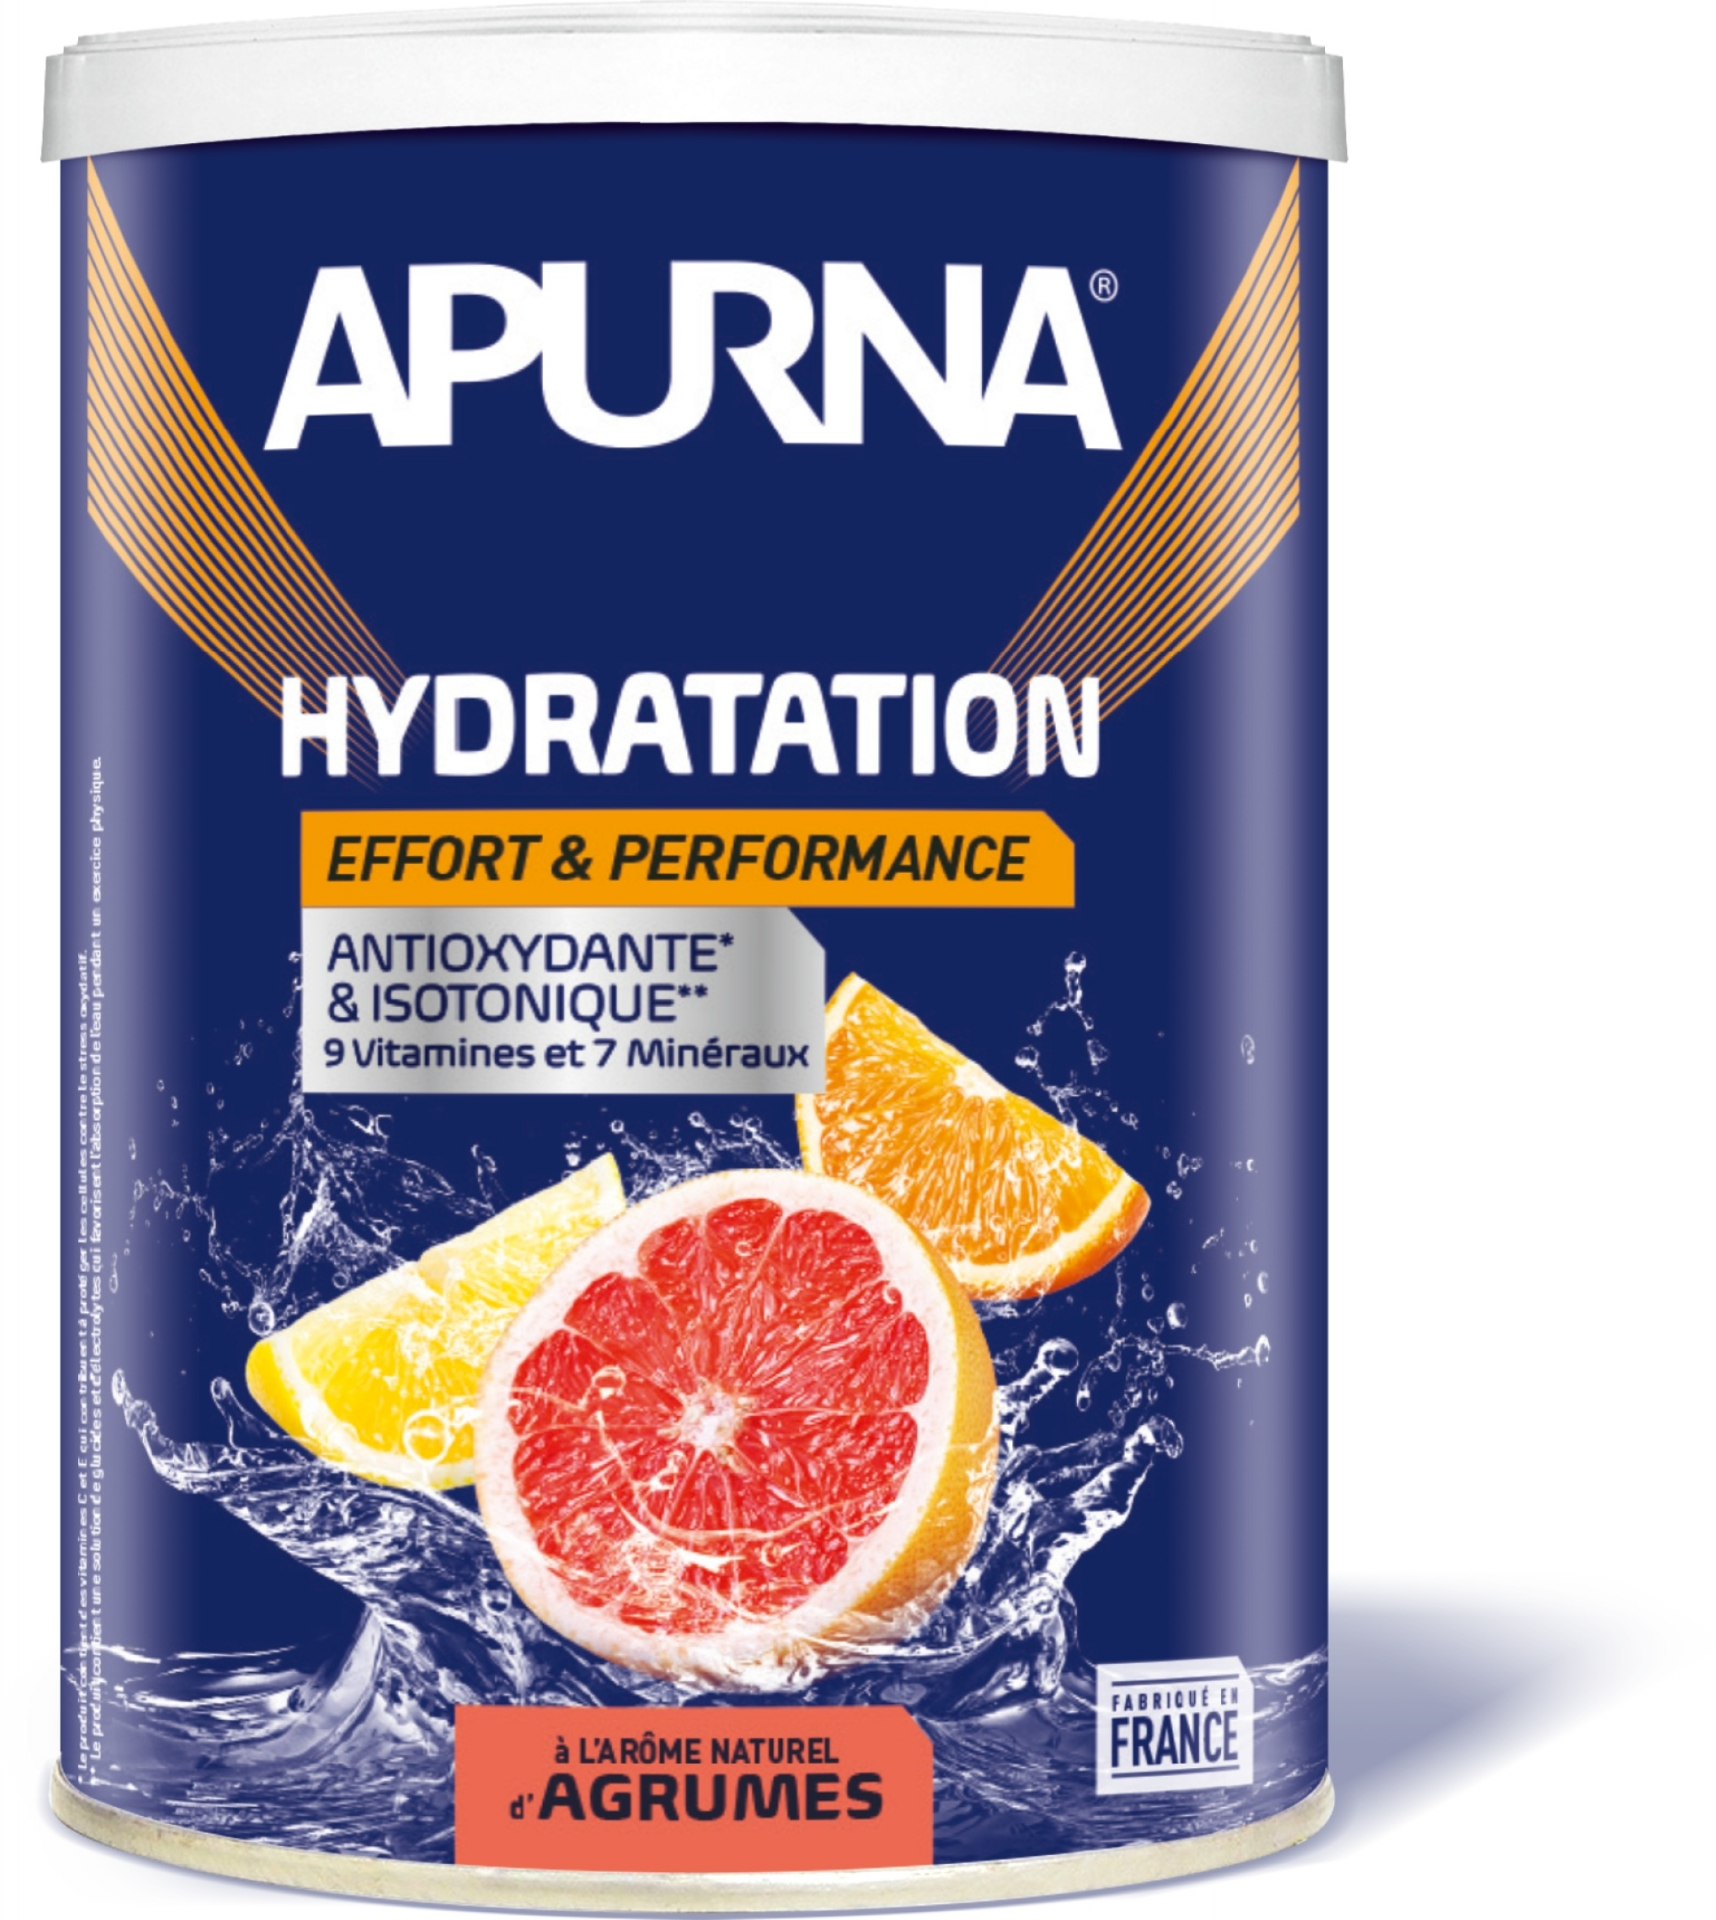 Boisson hydratation Apurna énergie Agrumes 500 g